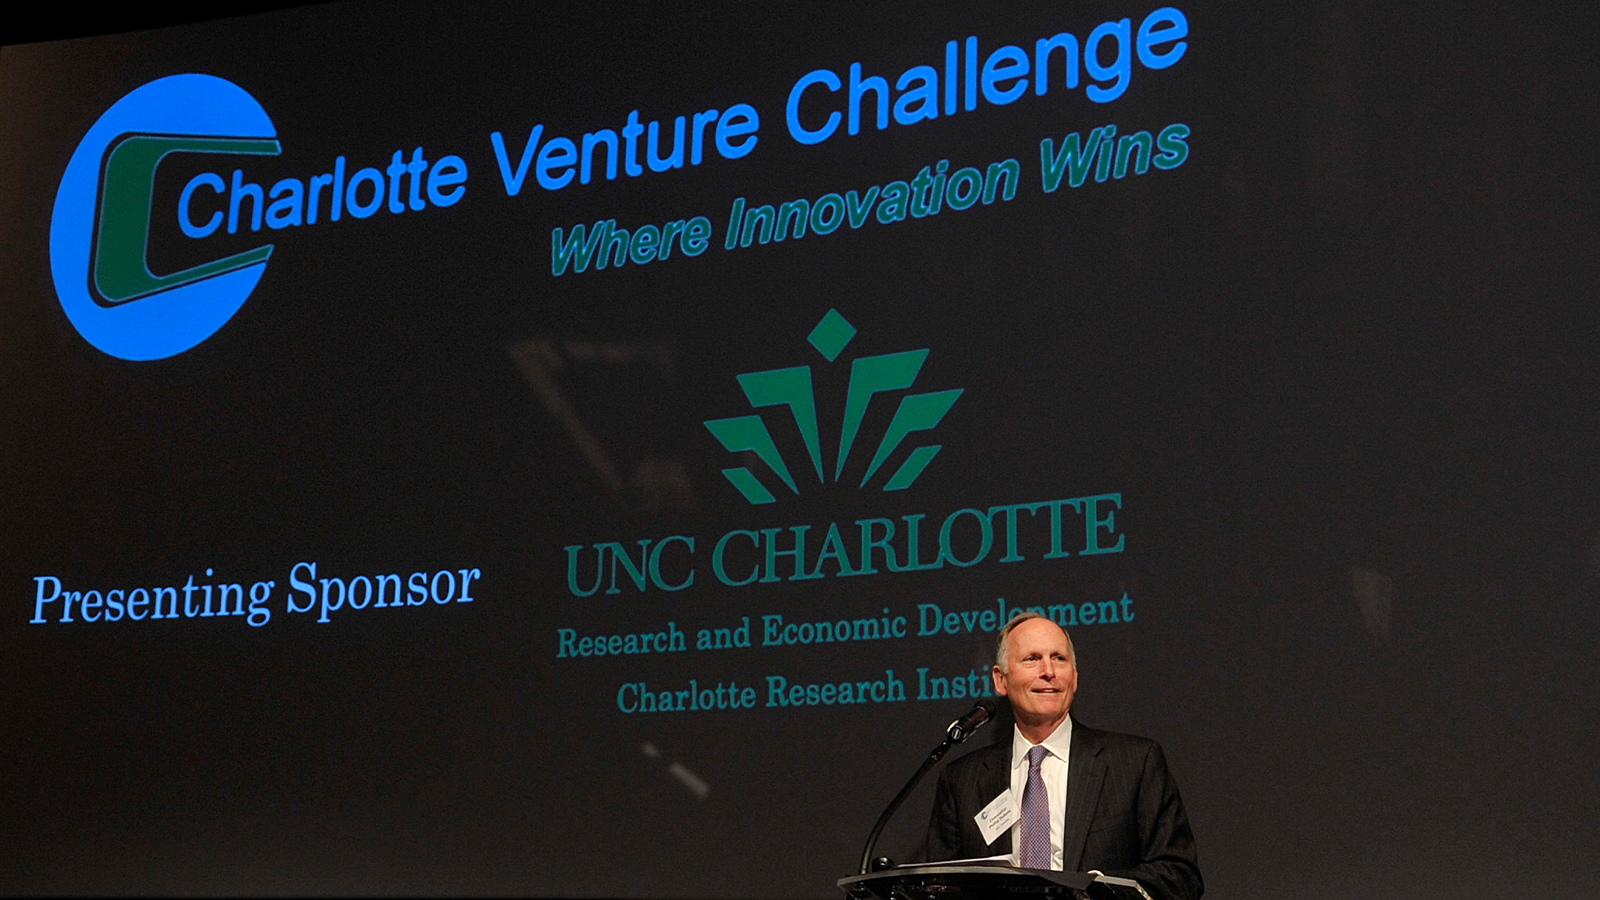 Man standing at podium announcing 2014 Charlotte Venture Challenge winner